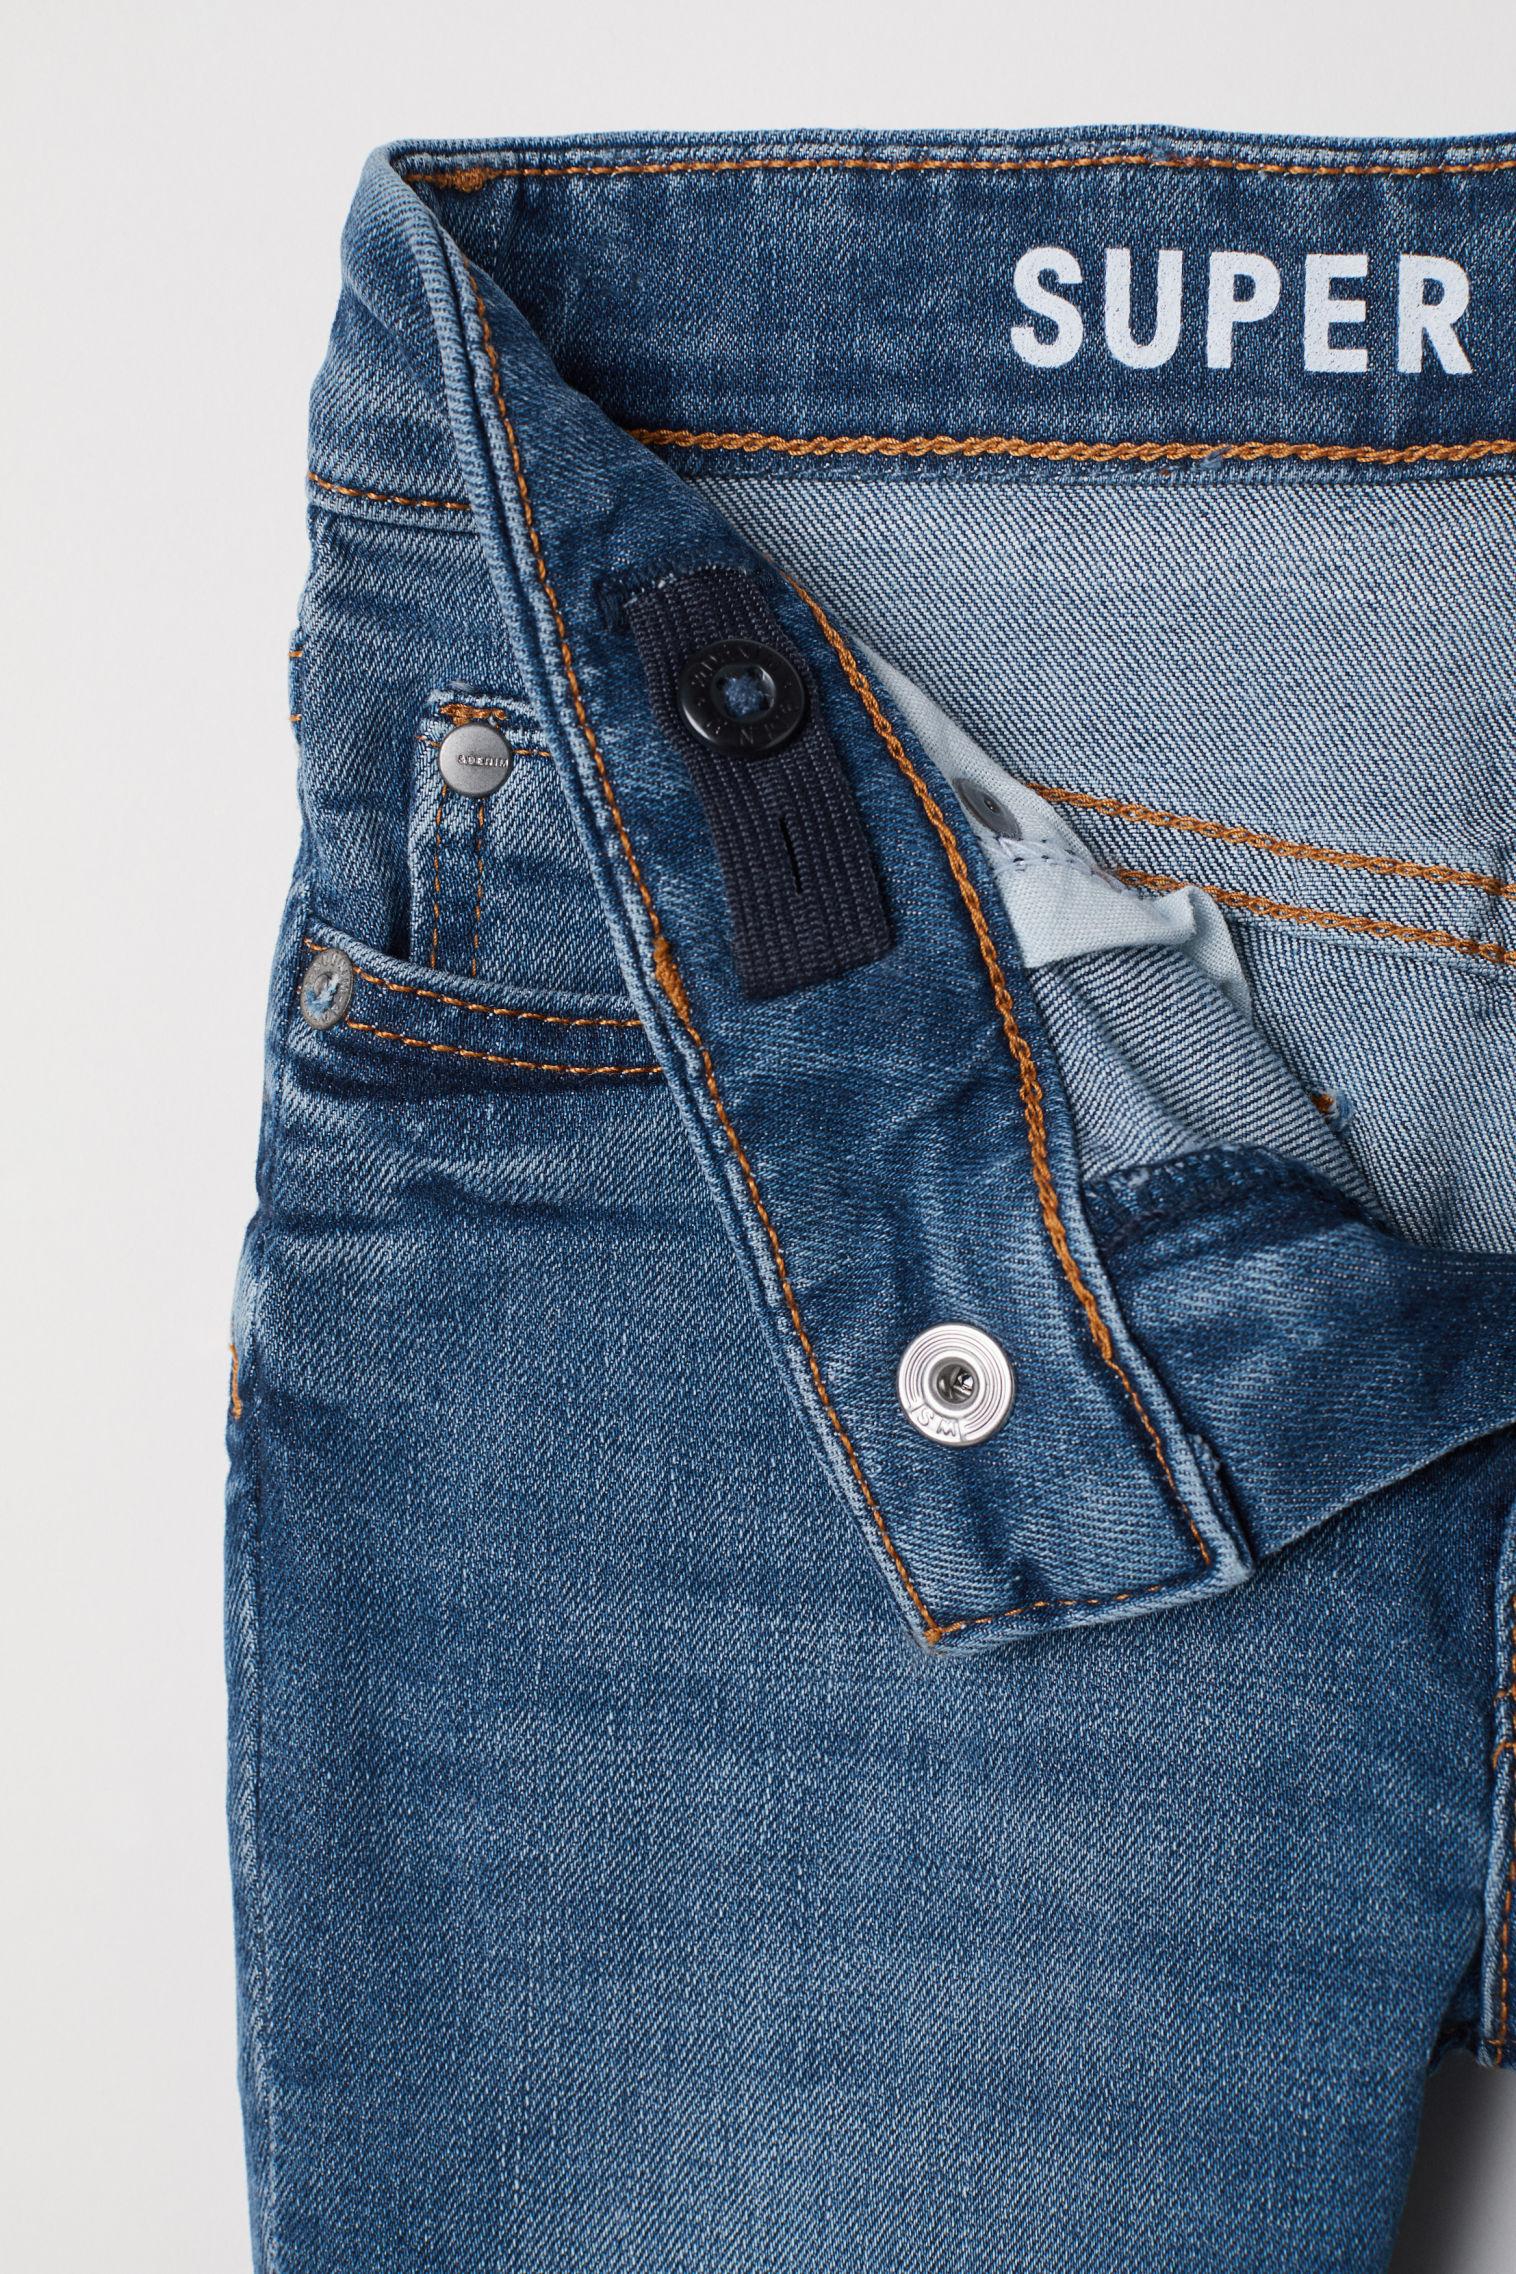 9c9a9b588ef Superstretch Skinny Fit Jeans · Superstretch Skinny Fit Jeans